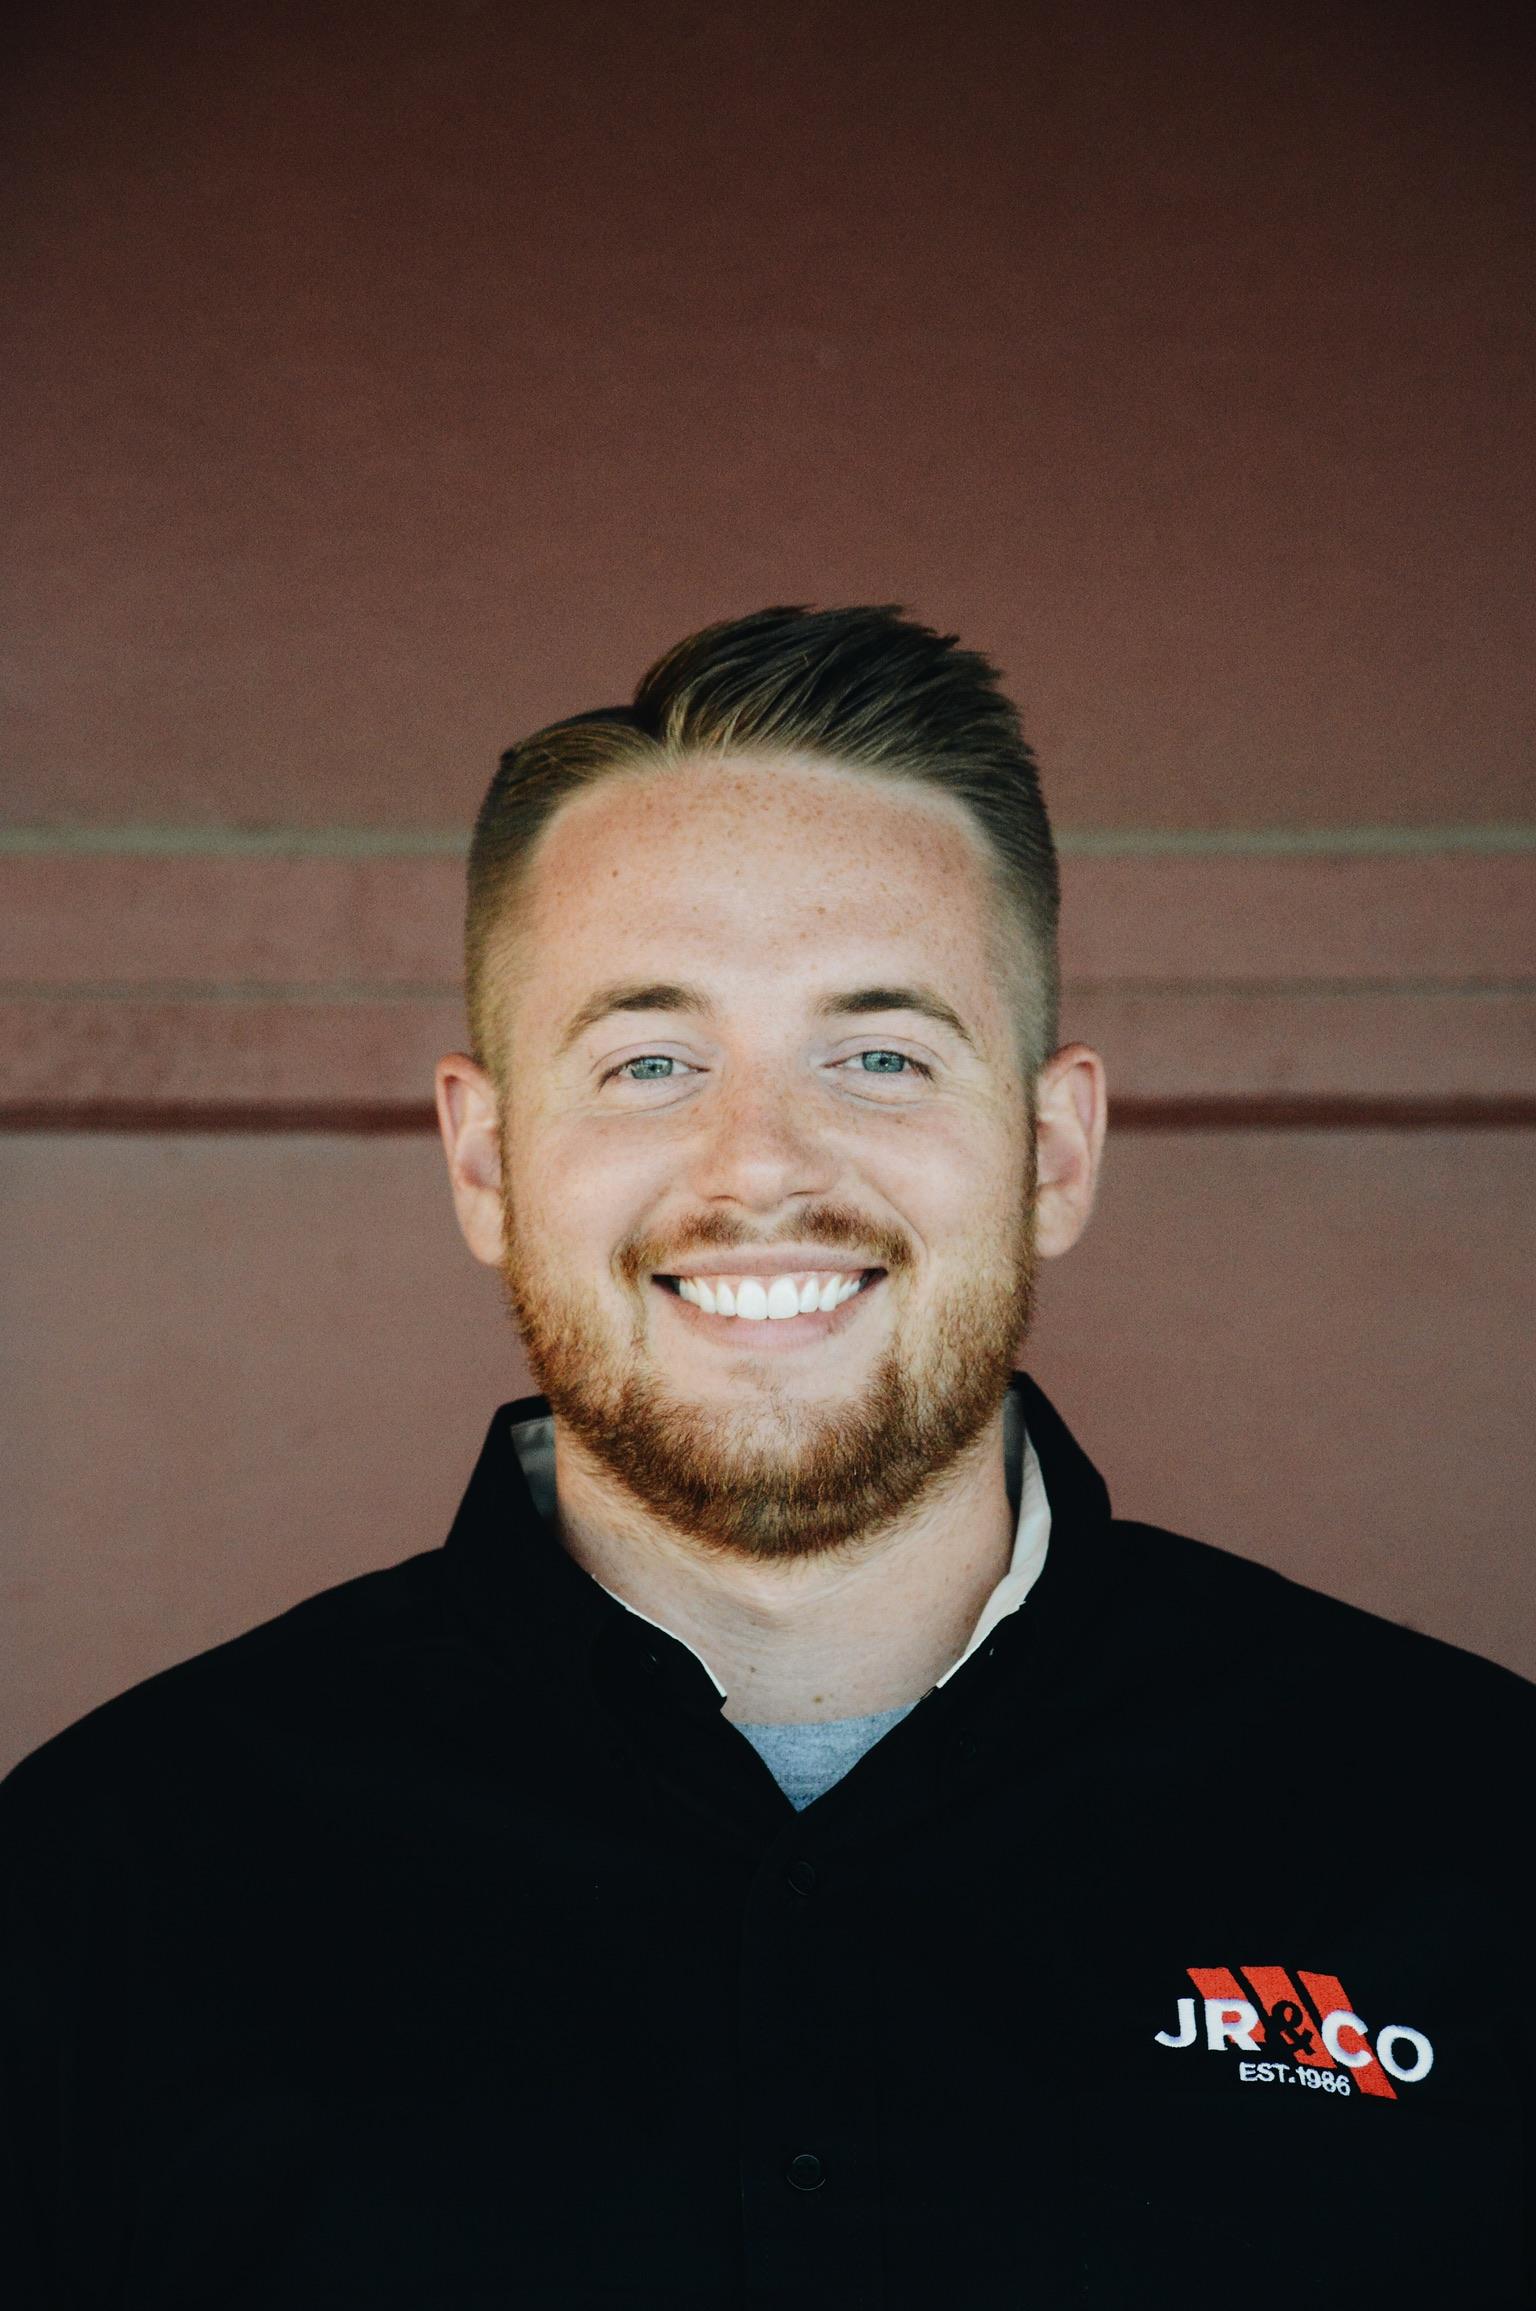 David Schilling - Branch Manager